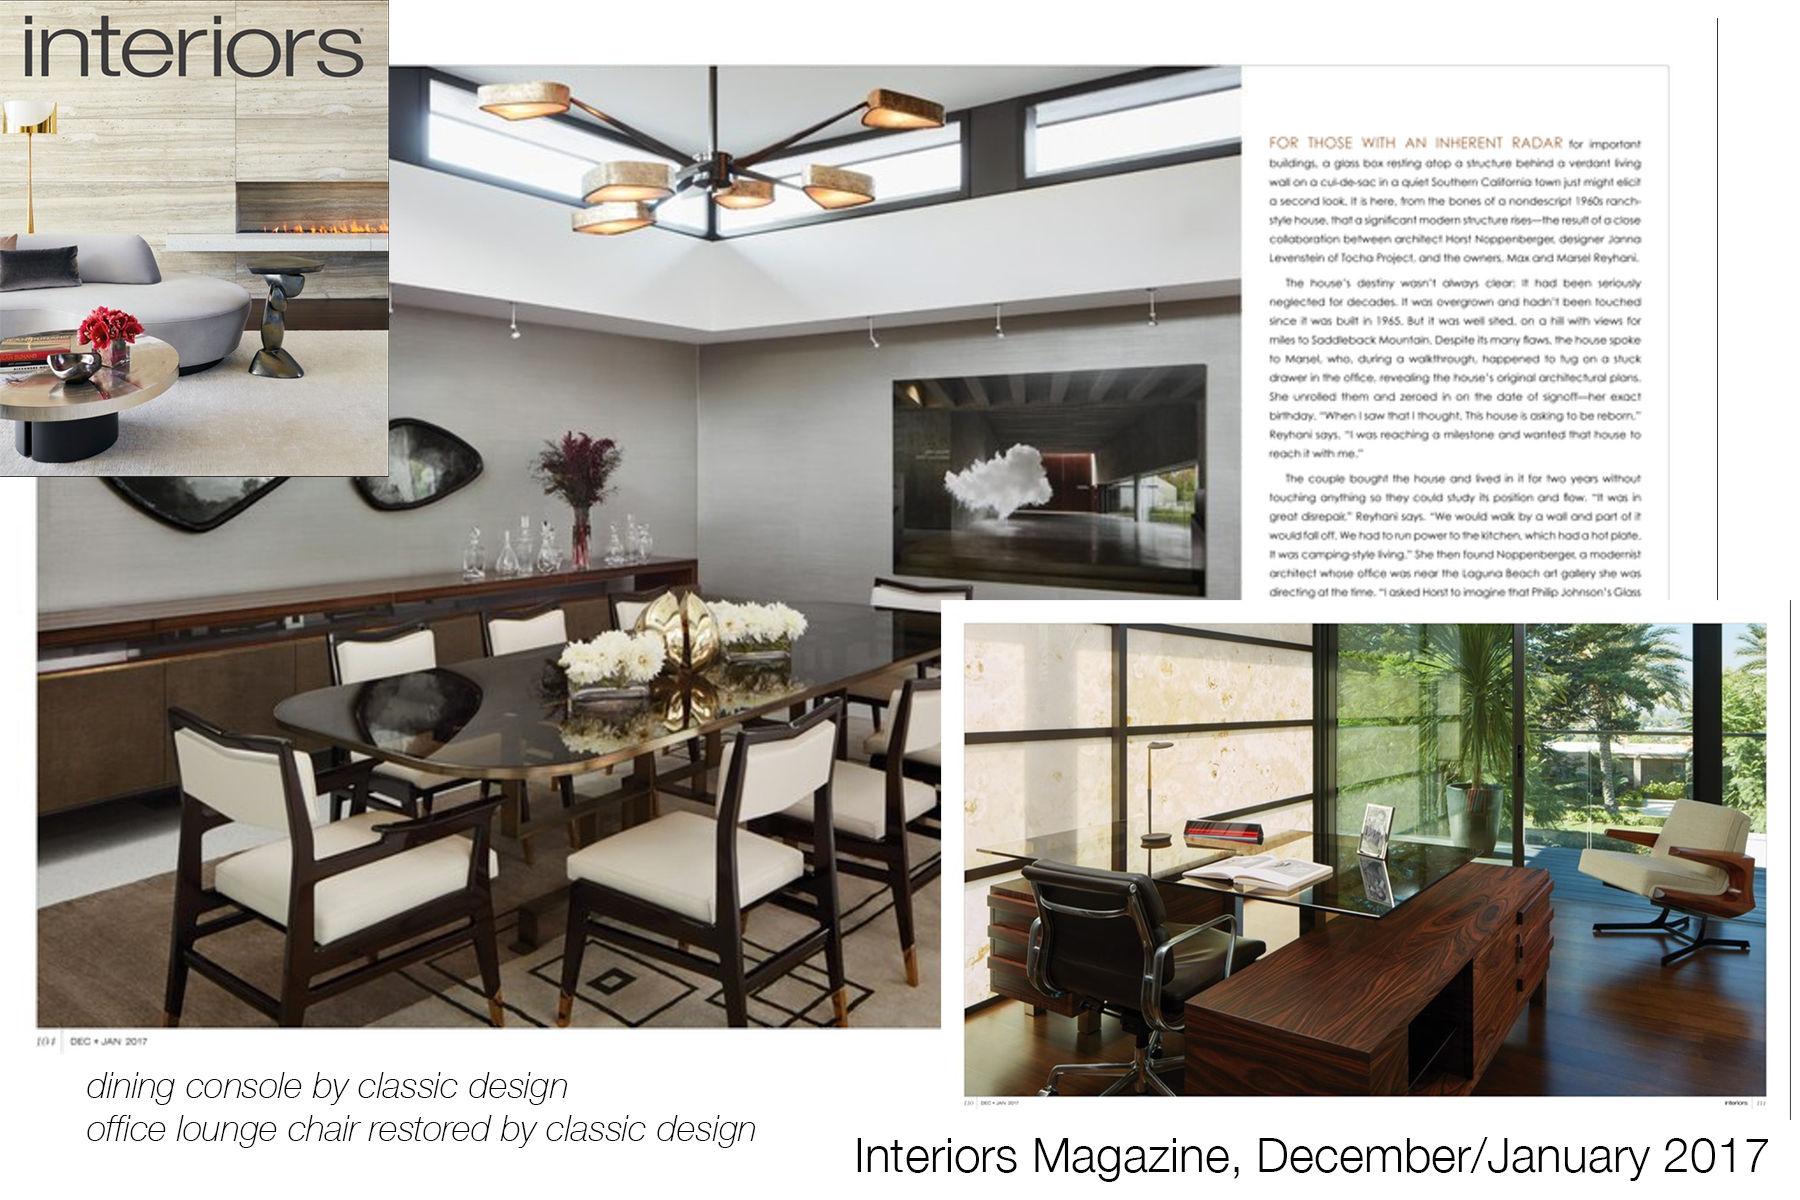 Interiors Magazine - December/January 2017